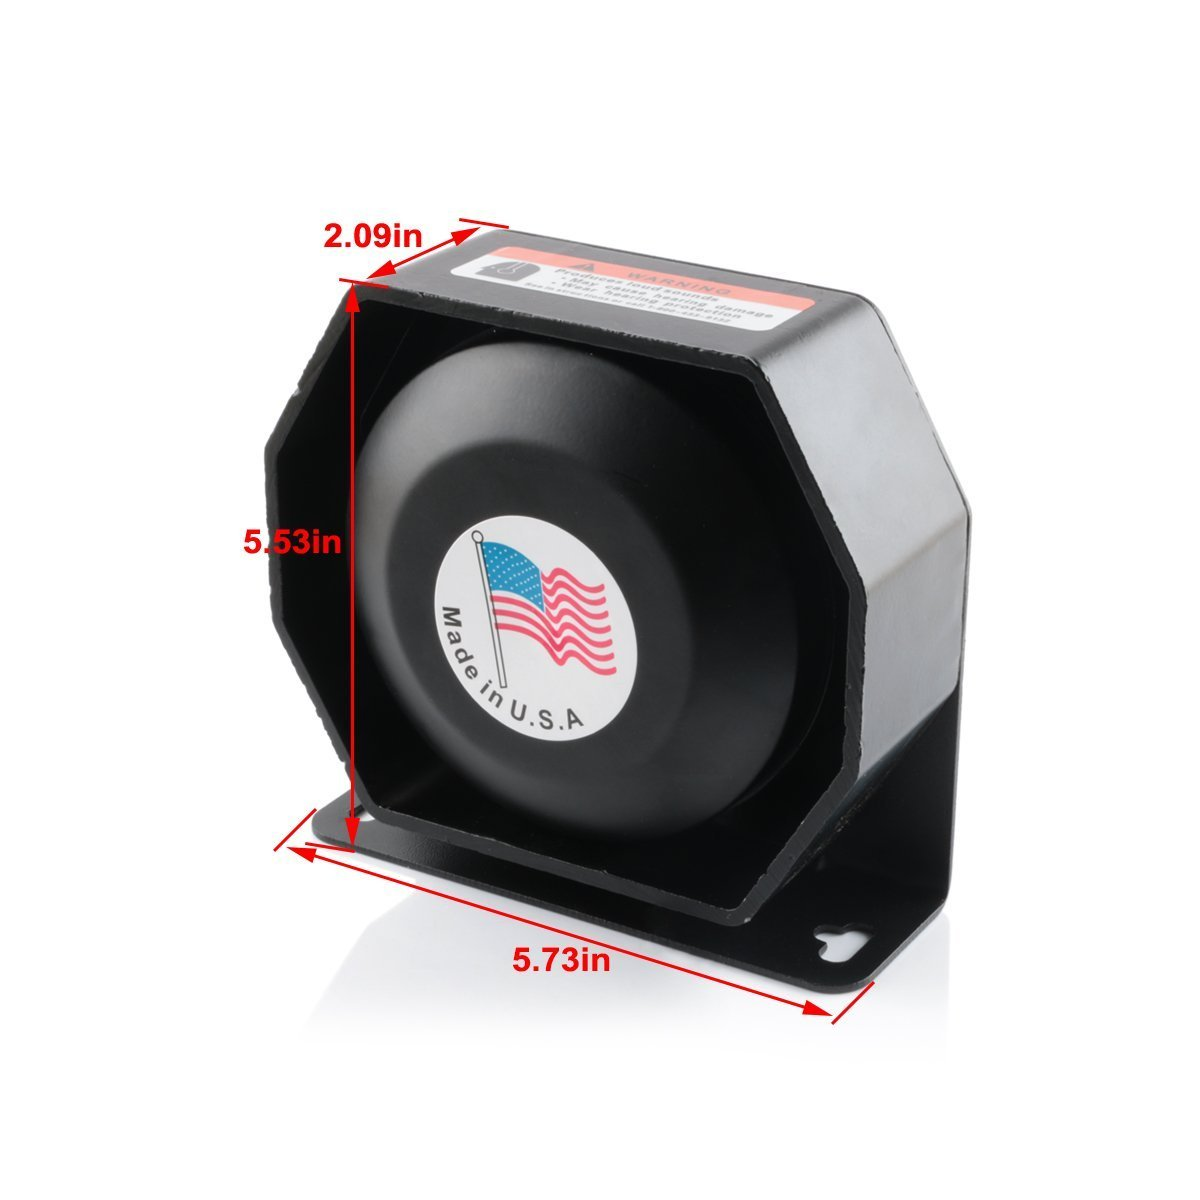 DENG 200W 8Sound Loud Car Warning Alarm Police Fire Siren Horn PA Speaker CJB by DENG (Image #2)